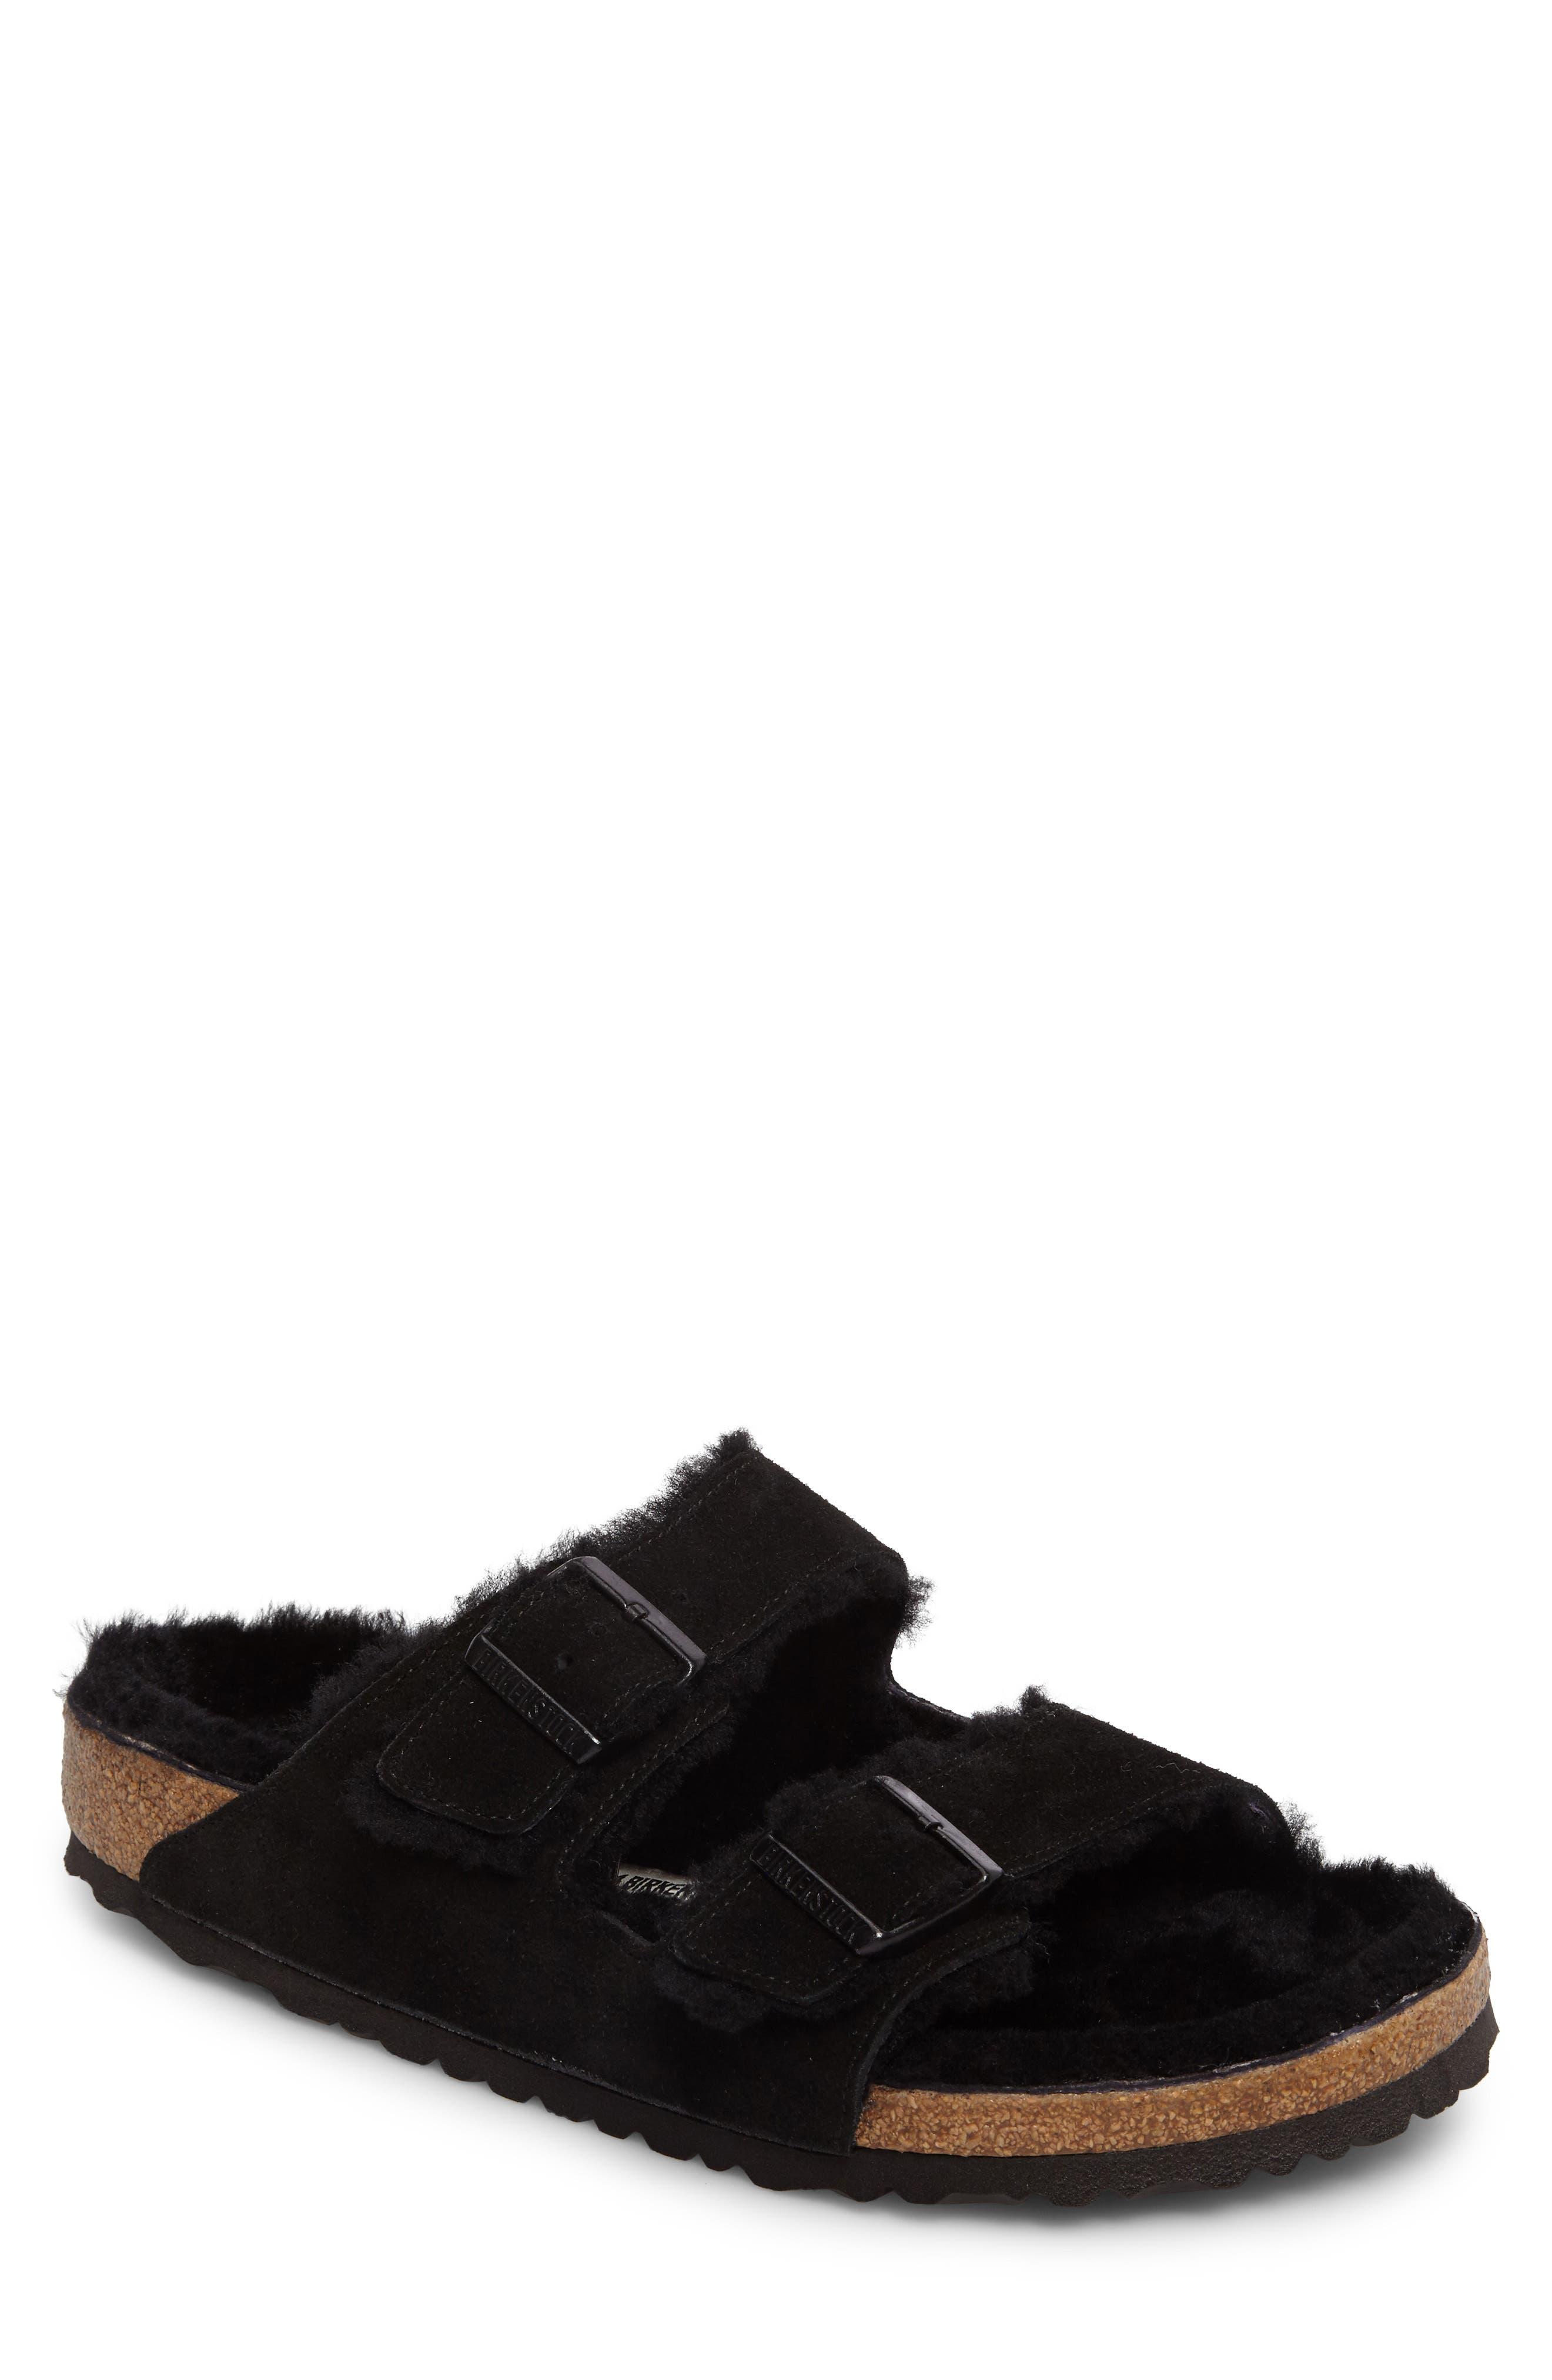 Birkenstock Arizona Slide Sandal With Genuine Shearling,10.5 - Black